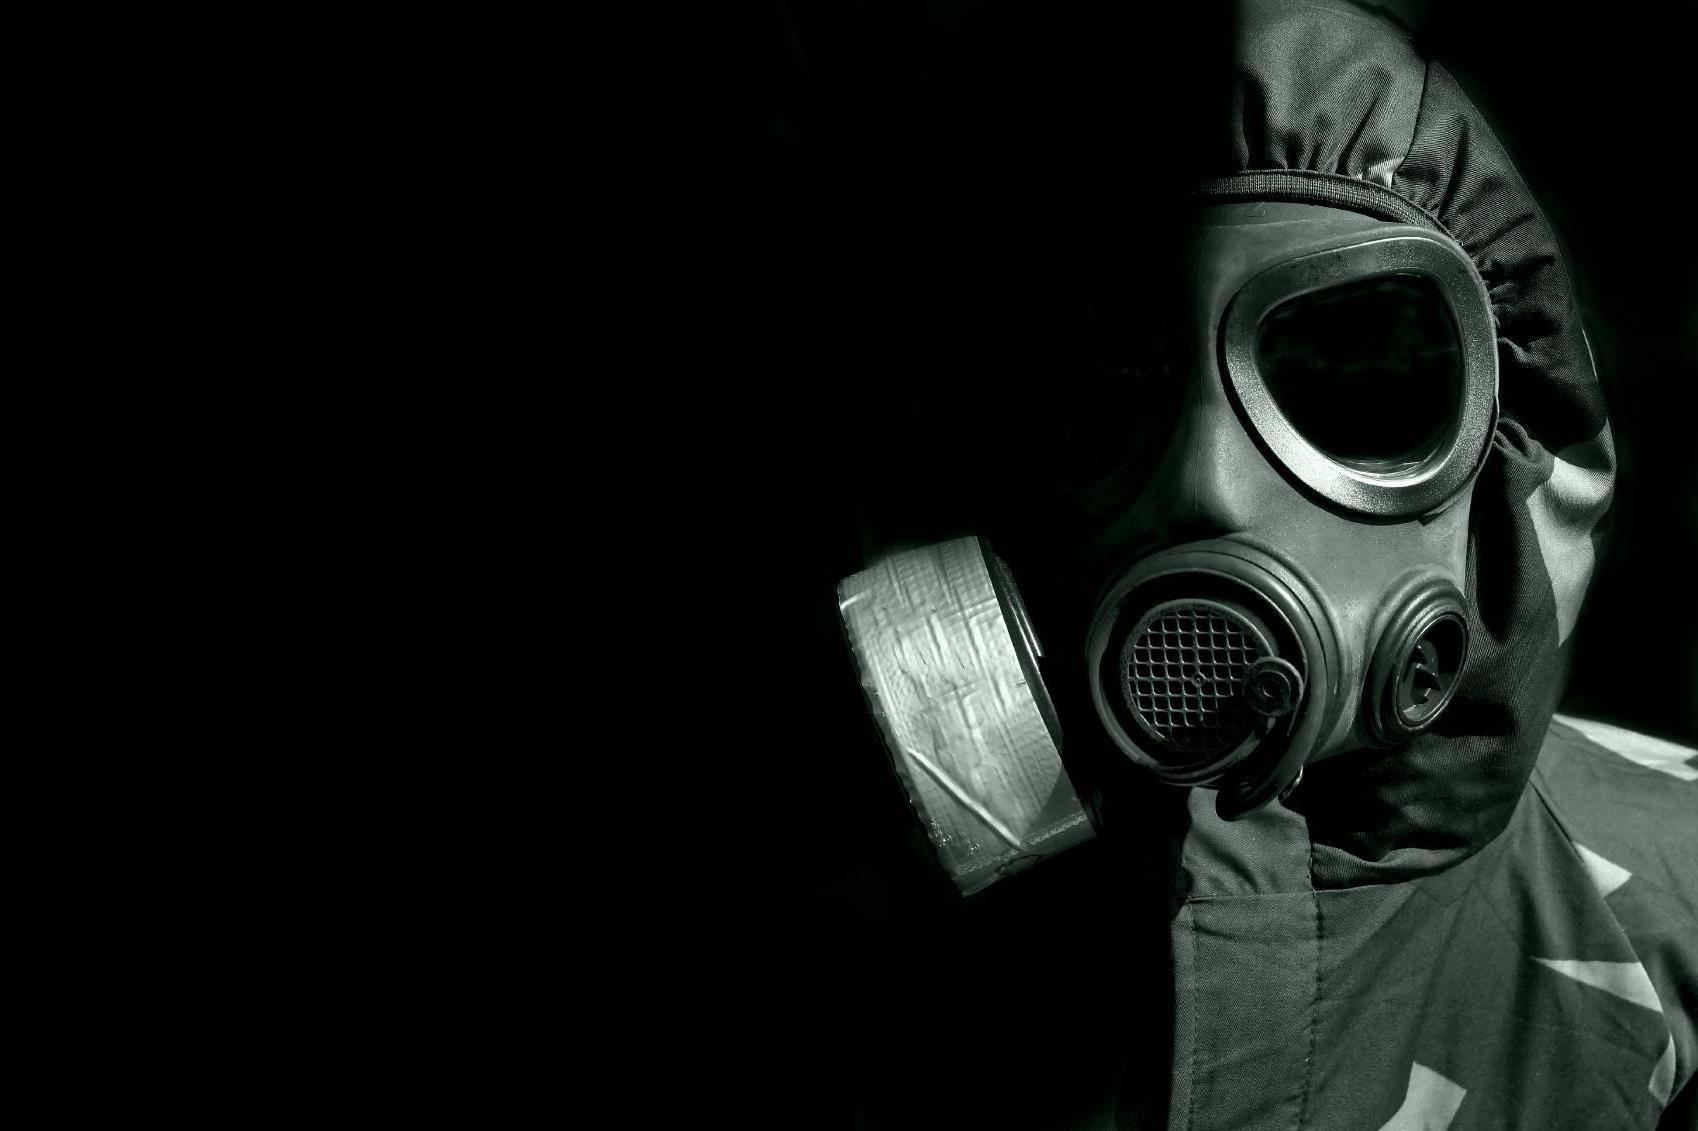 Free download Dubstep Wallpaper Gas Mask Red Gasmask ...